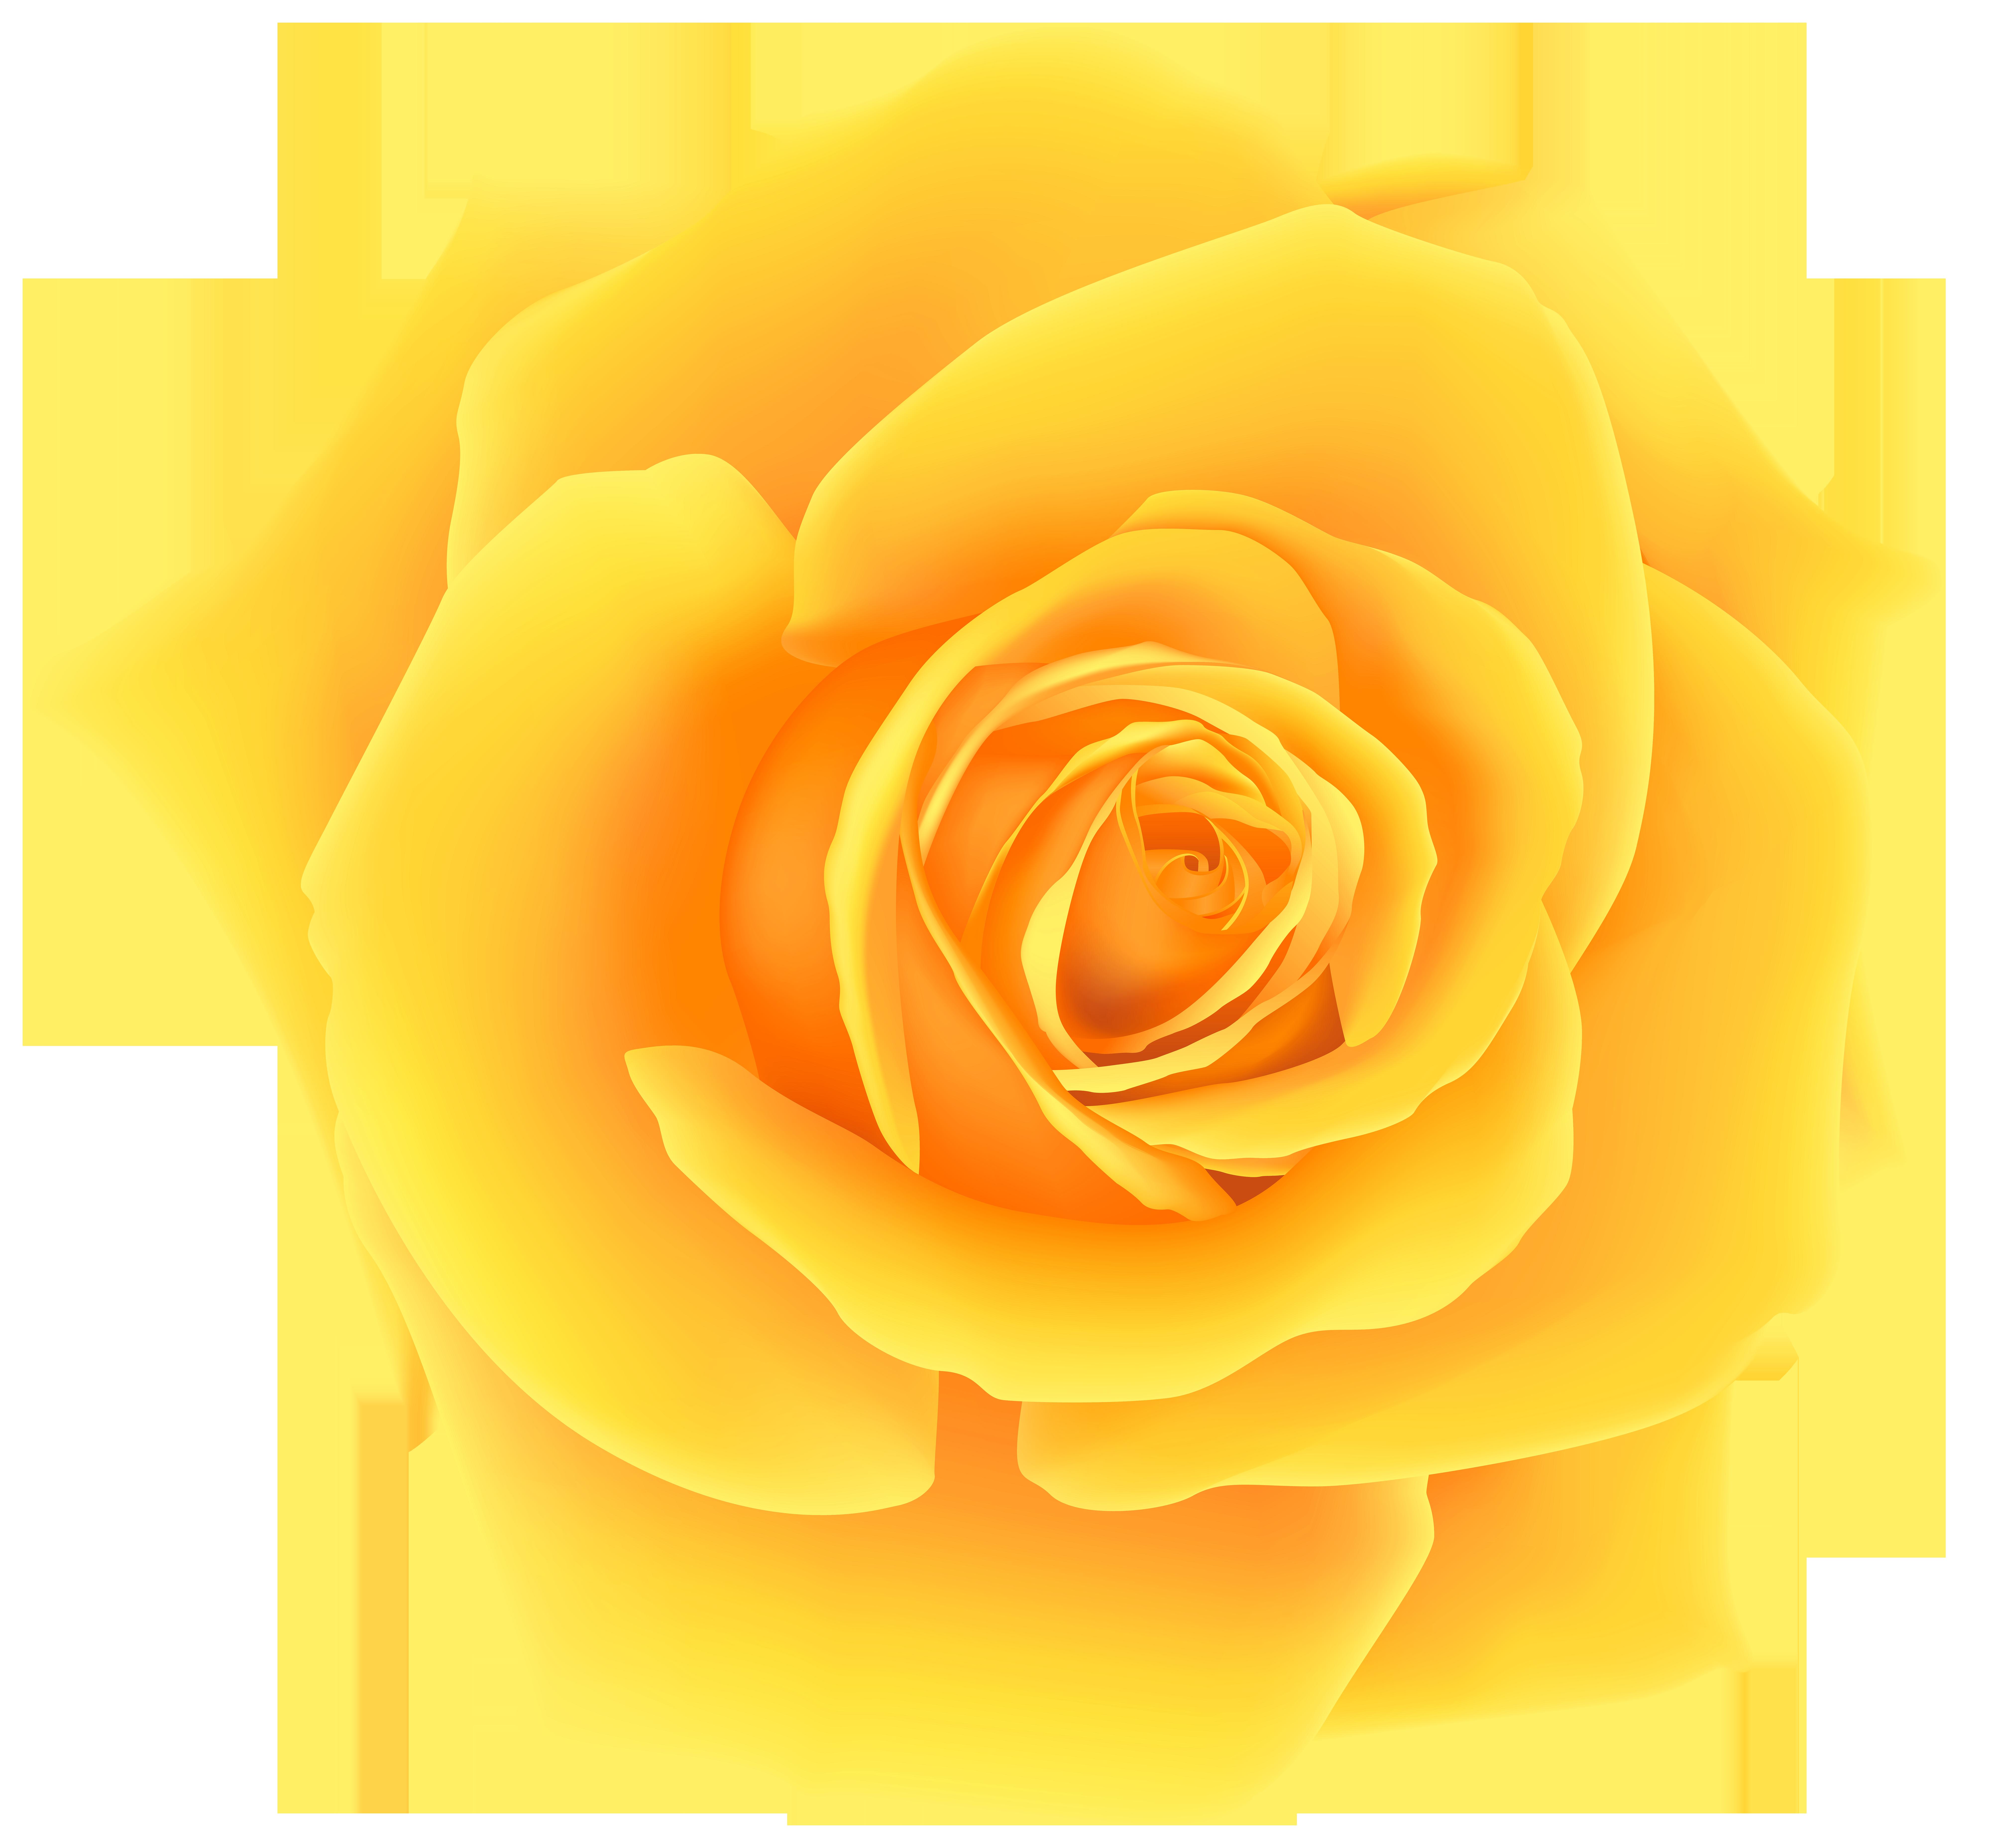 Yellow Rose clipart orange rose Yopriceville Gallery Rose High Yellow